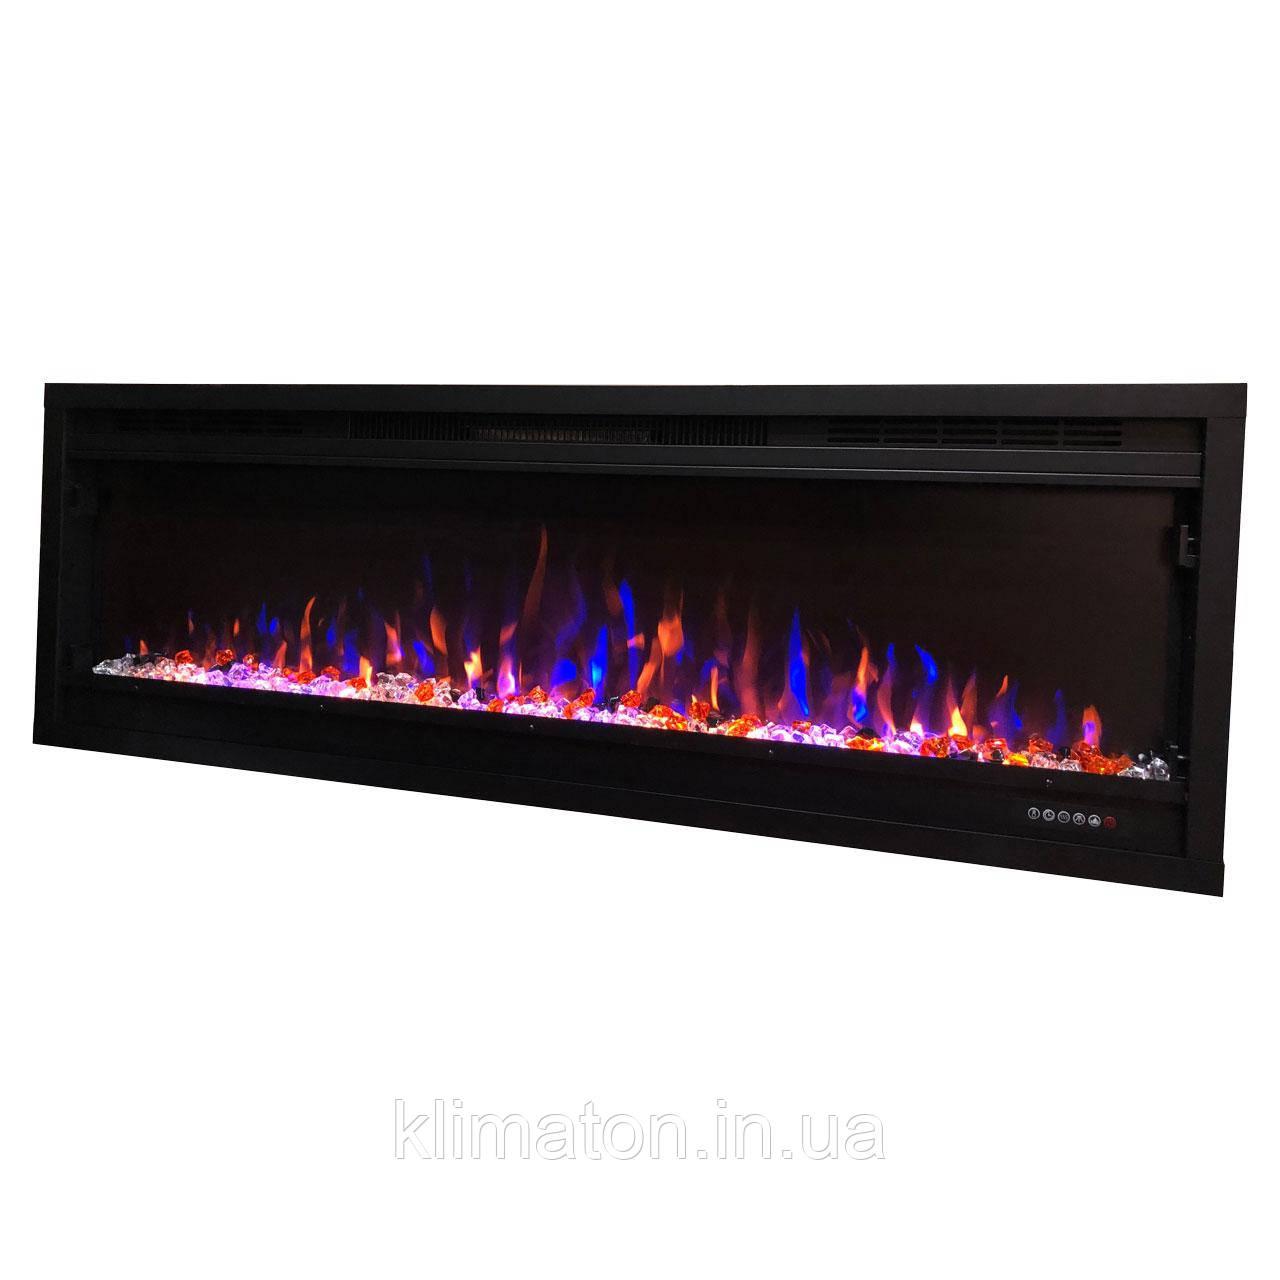 Електрокамін Royal Flame Royal Fire BI 50 wf